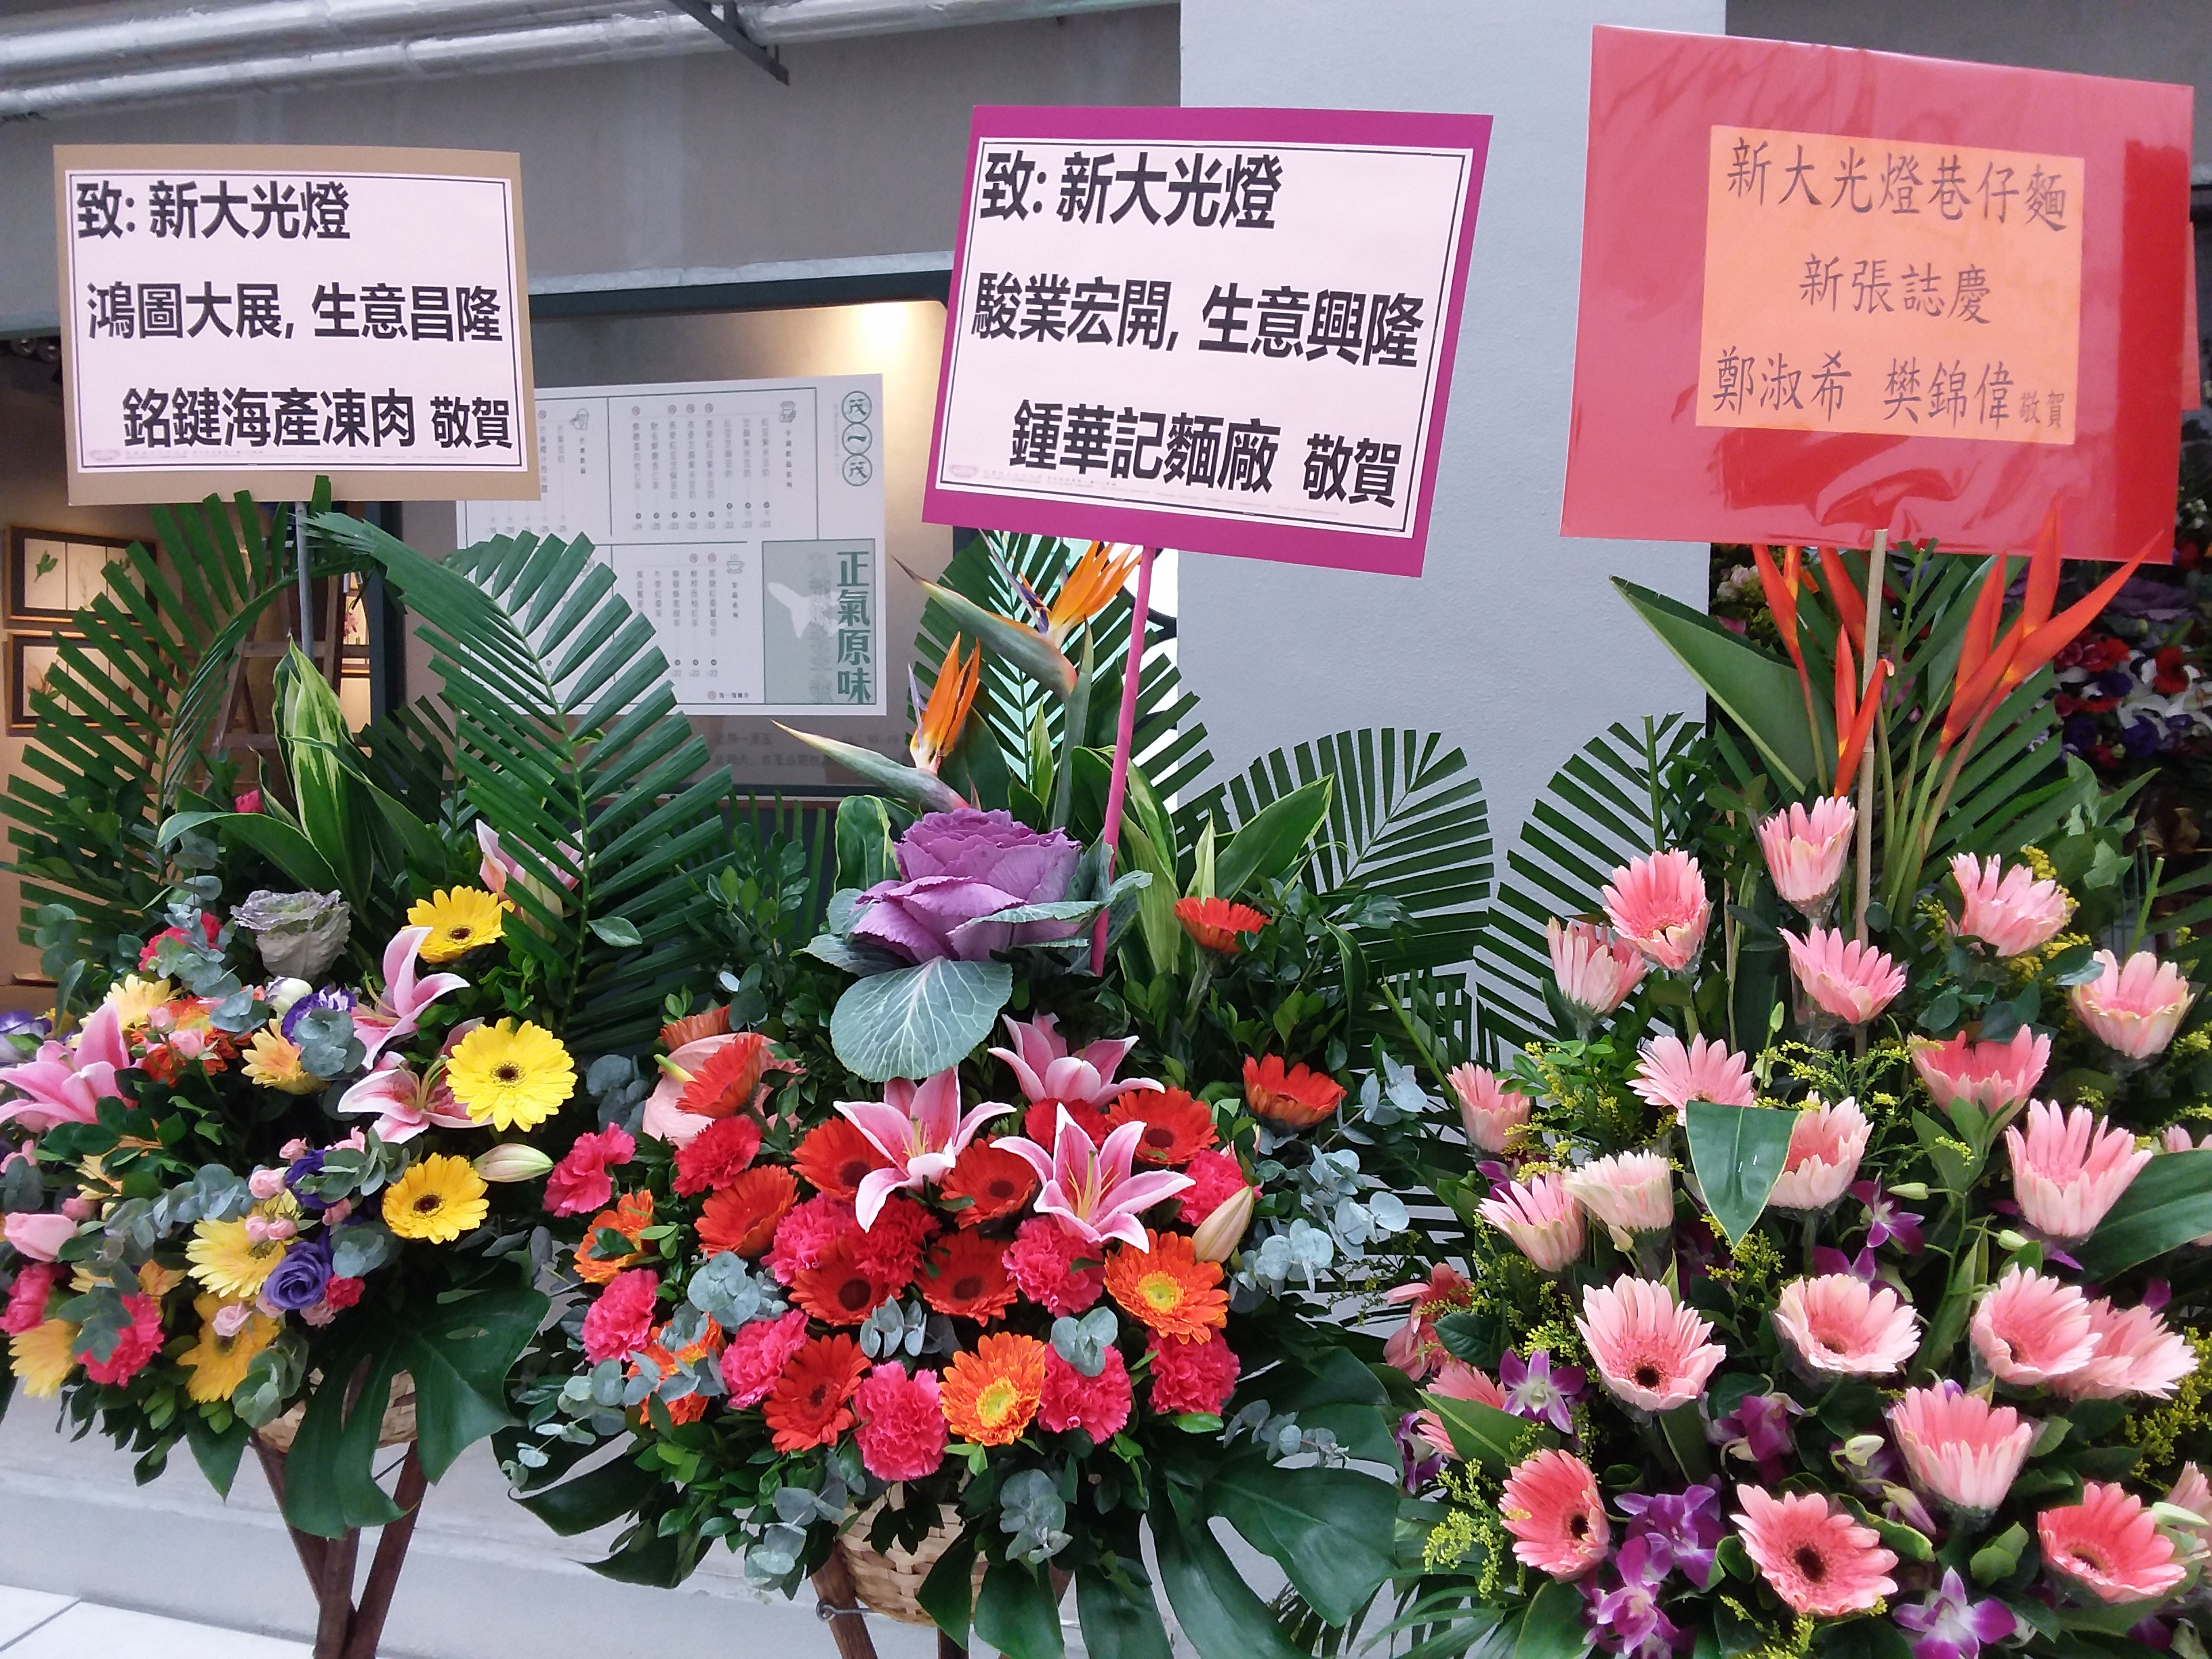 File:HK 荃灣 Tsuen Wan 白田壩街 45 Pak Tin Par Street 南豐紗